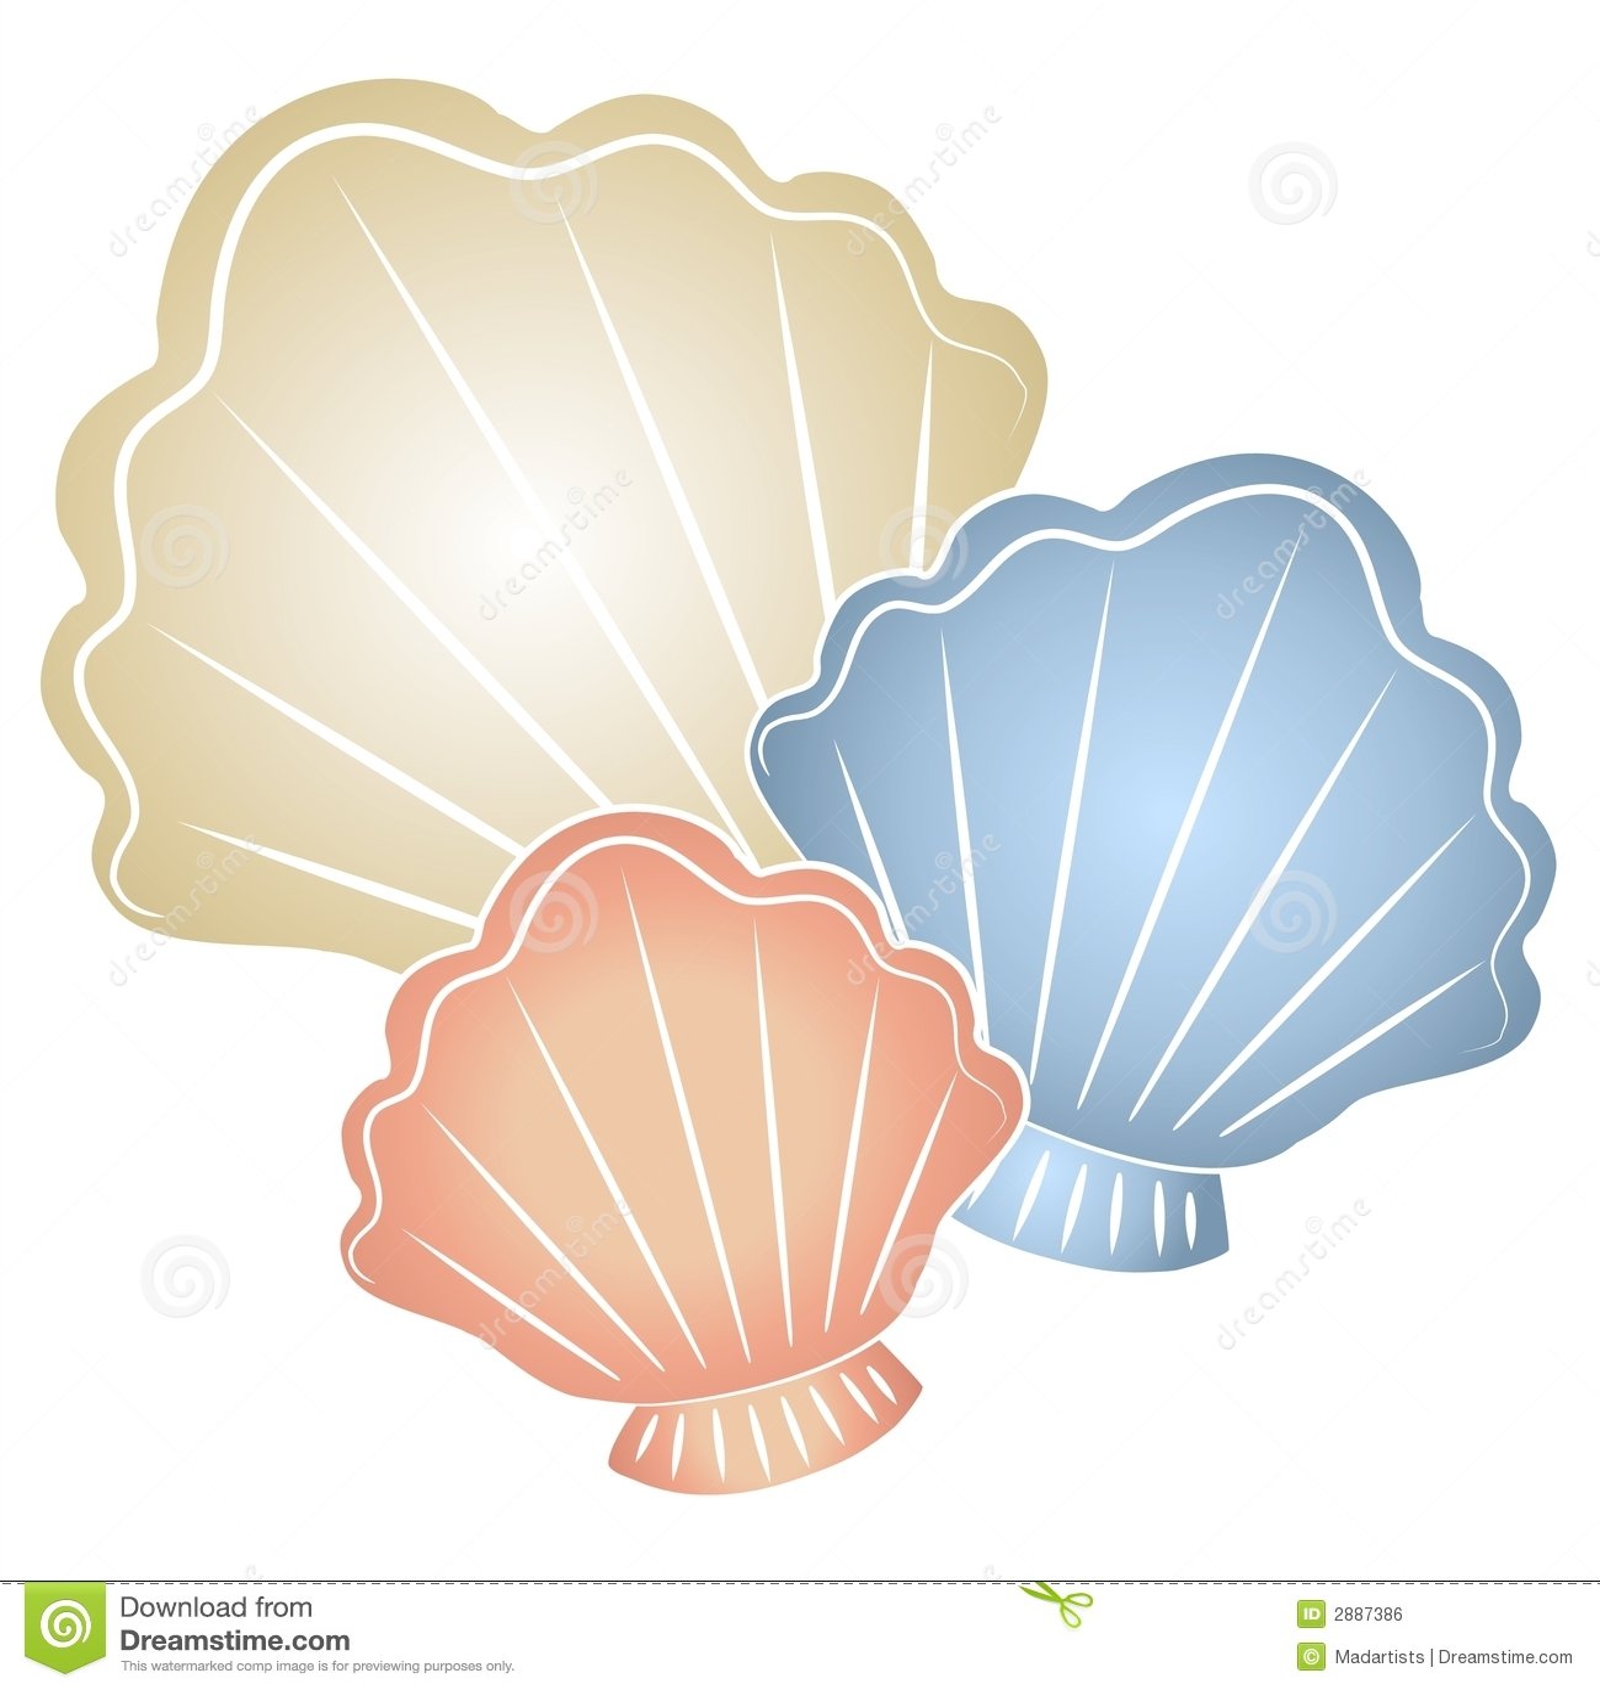 clip art illustration of pastel colored seashells in light tan, blue ...